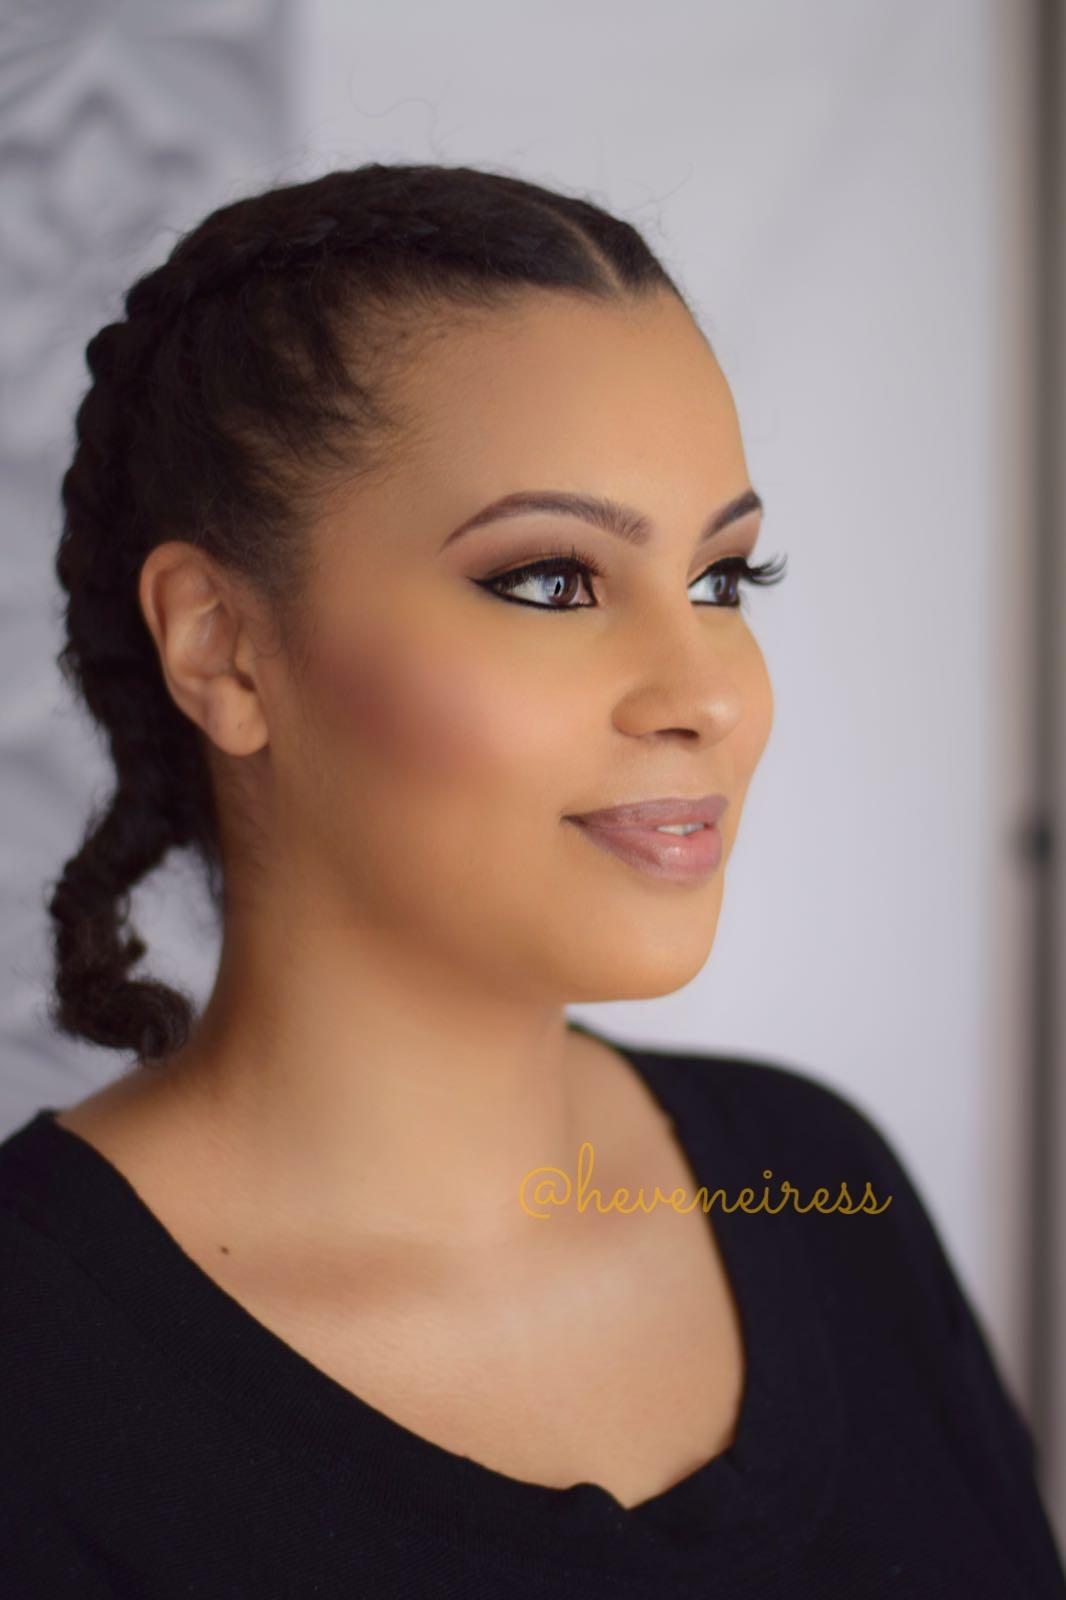 ... heveneiress - london makeup artists - bella naija - asoebi - makeup on black skin ...